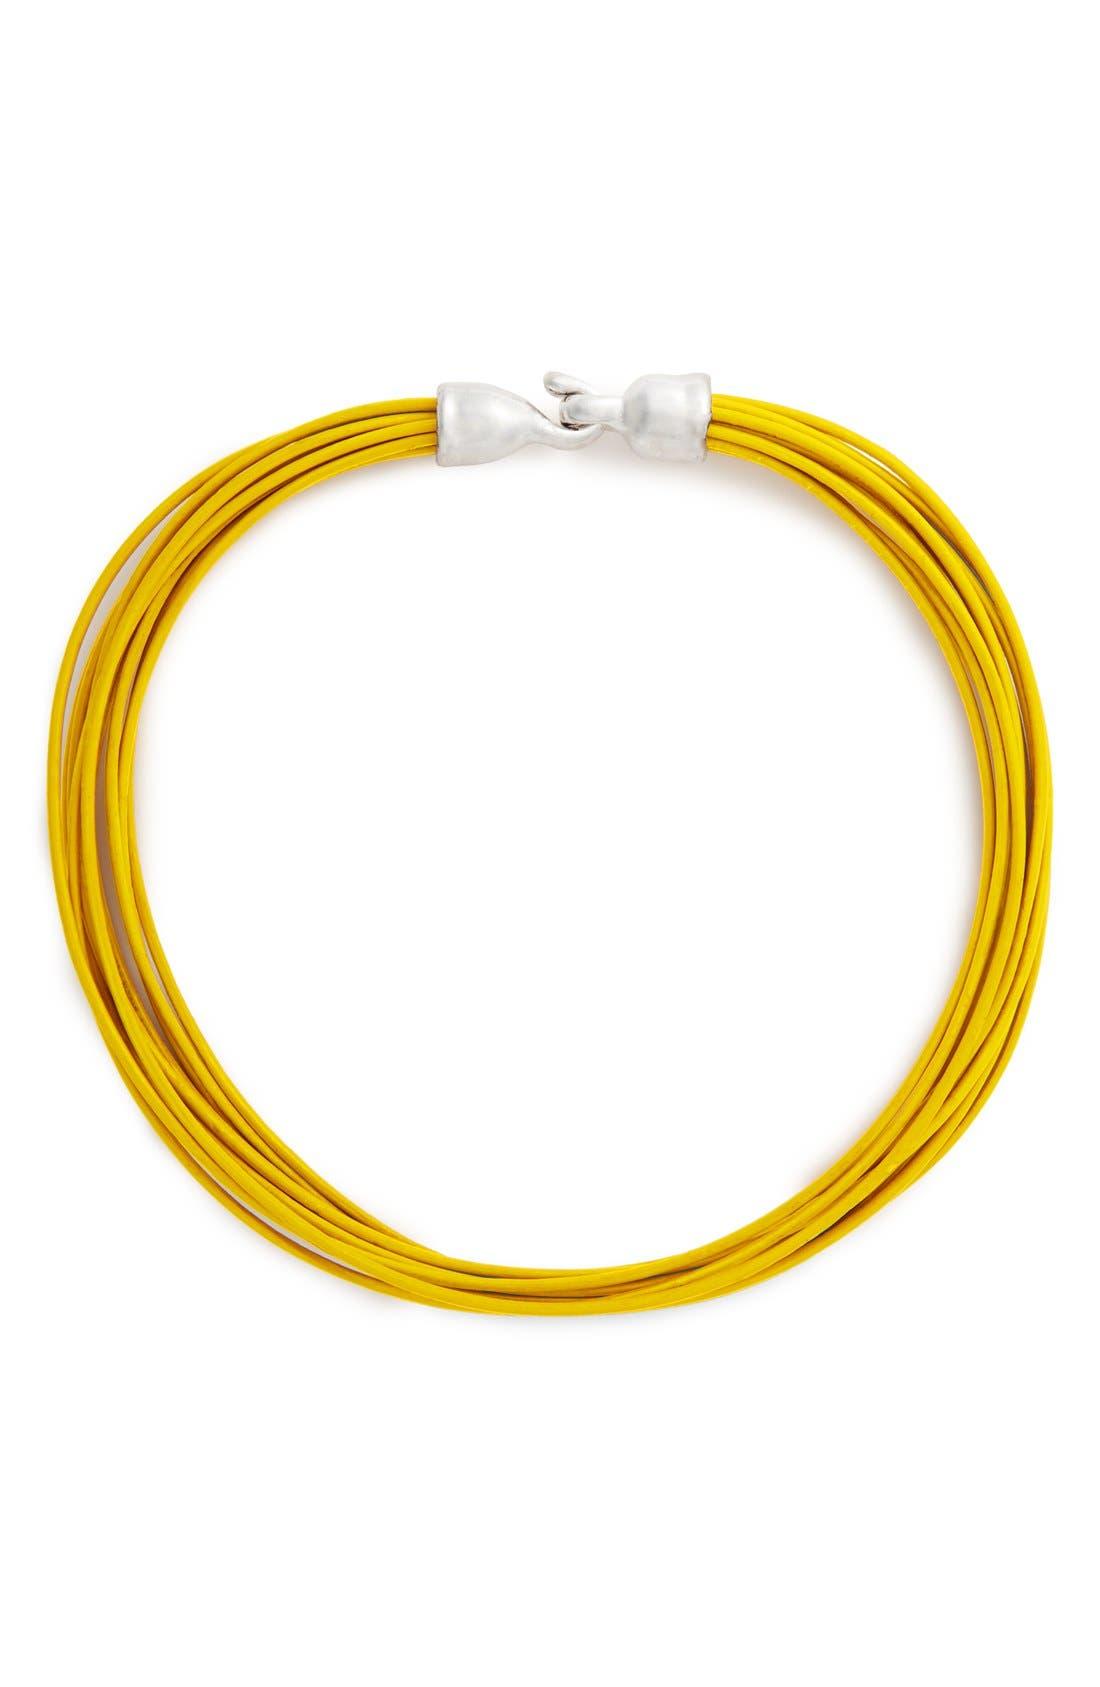 Main Image - Simon Sebbag Multistrand Leather Necklace